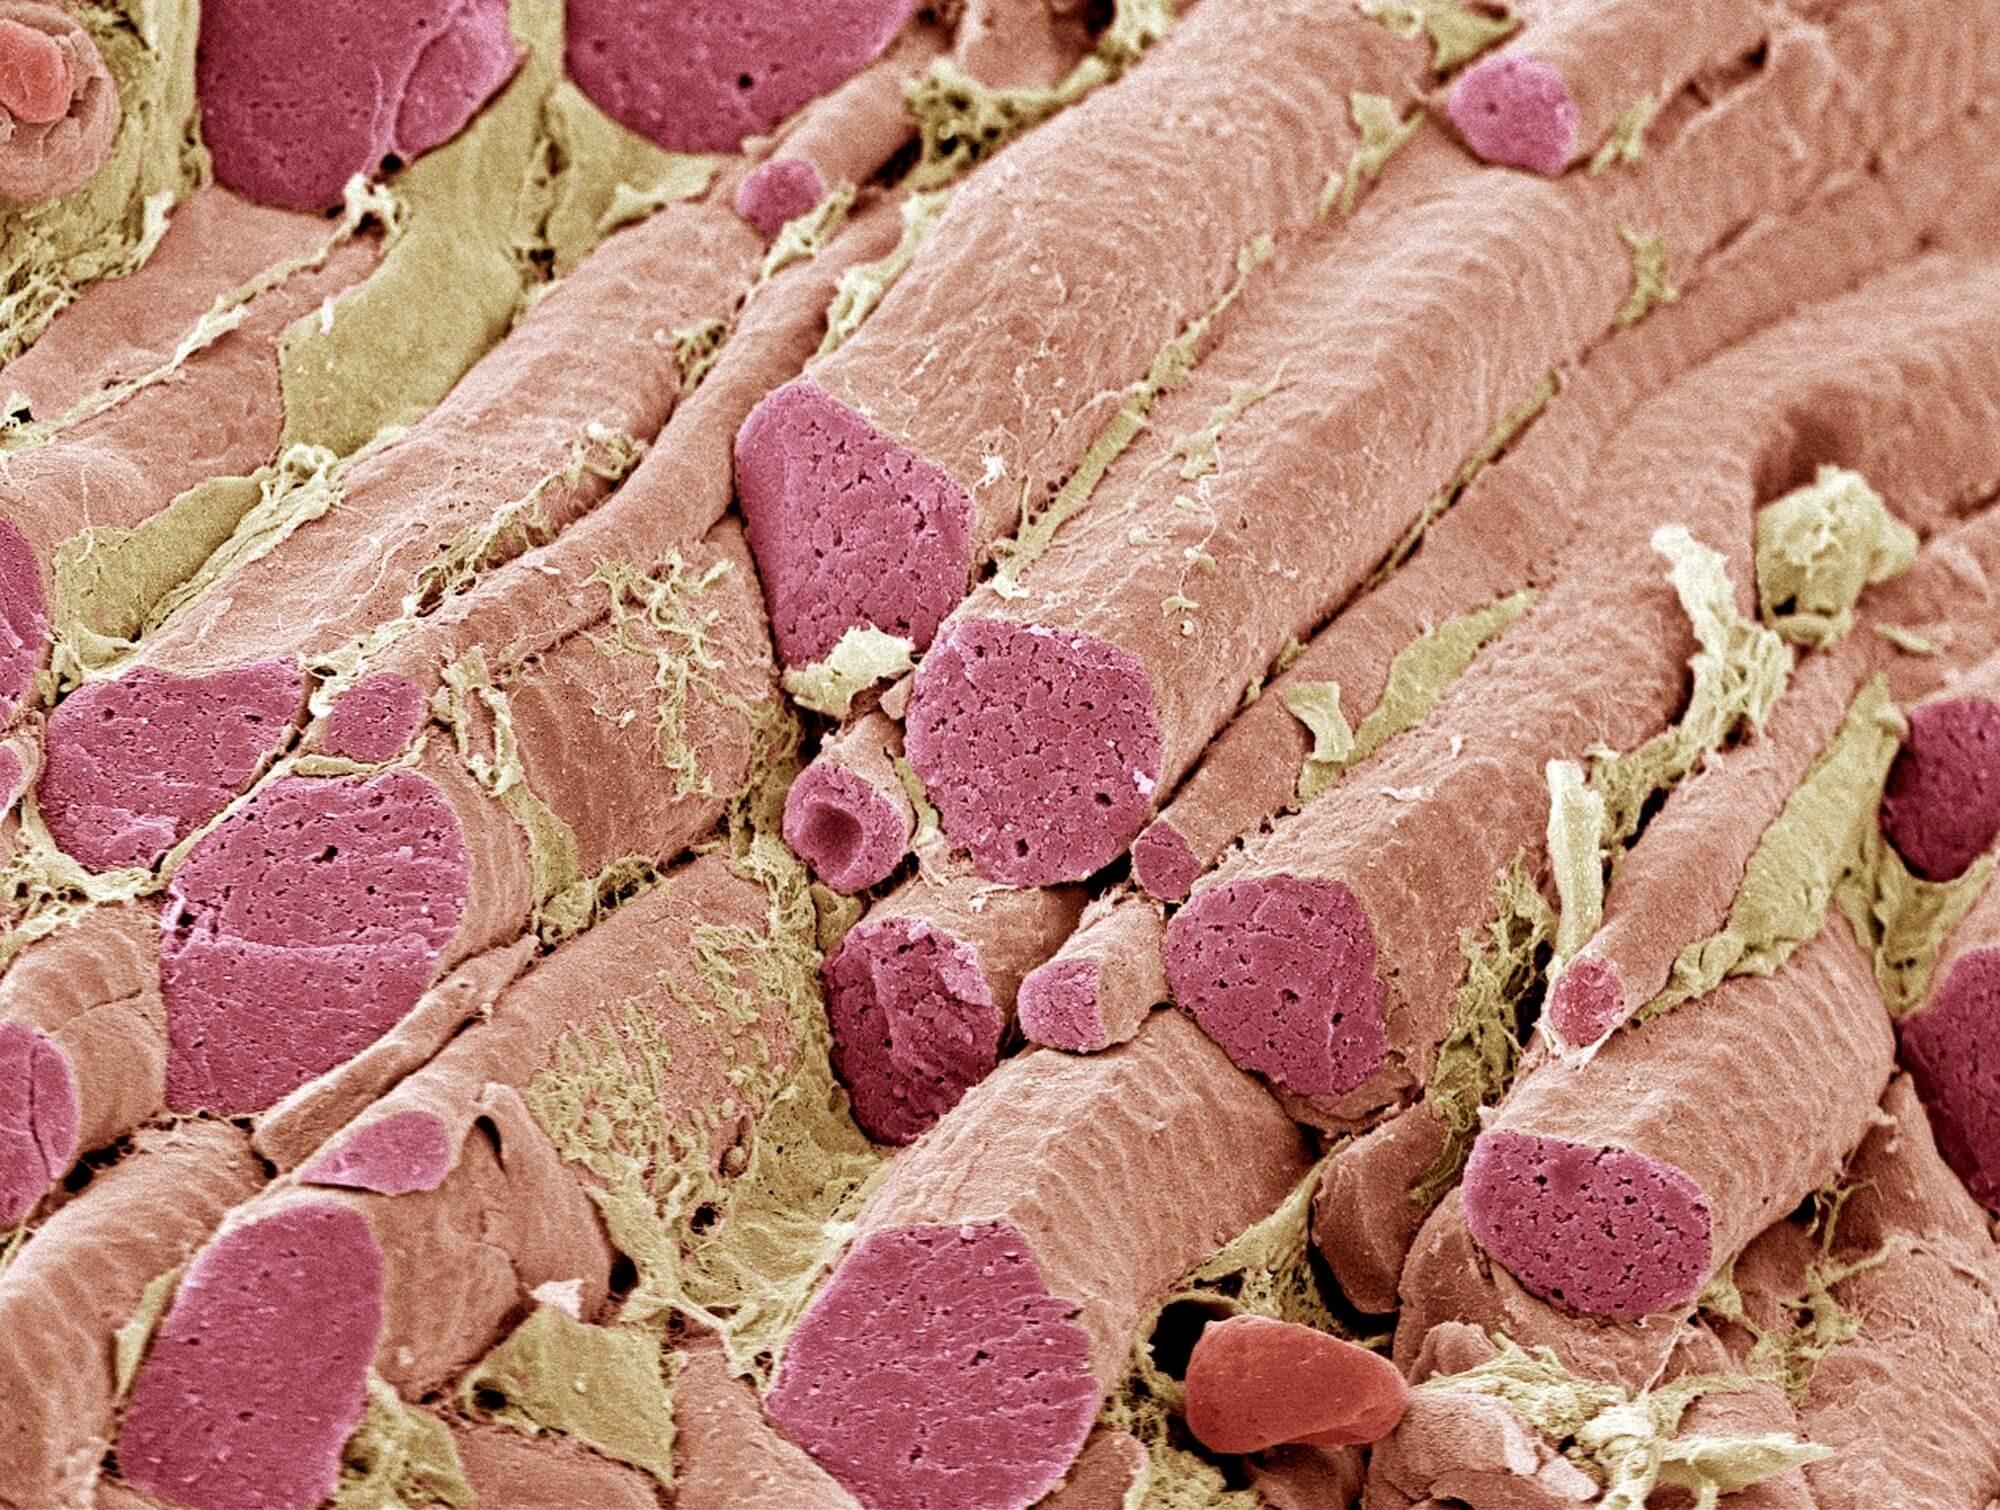 Onset of Musculoskeletal Adverse Events Varies Between Statins